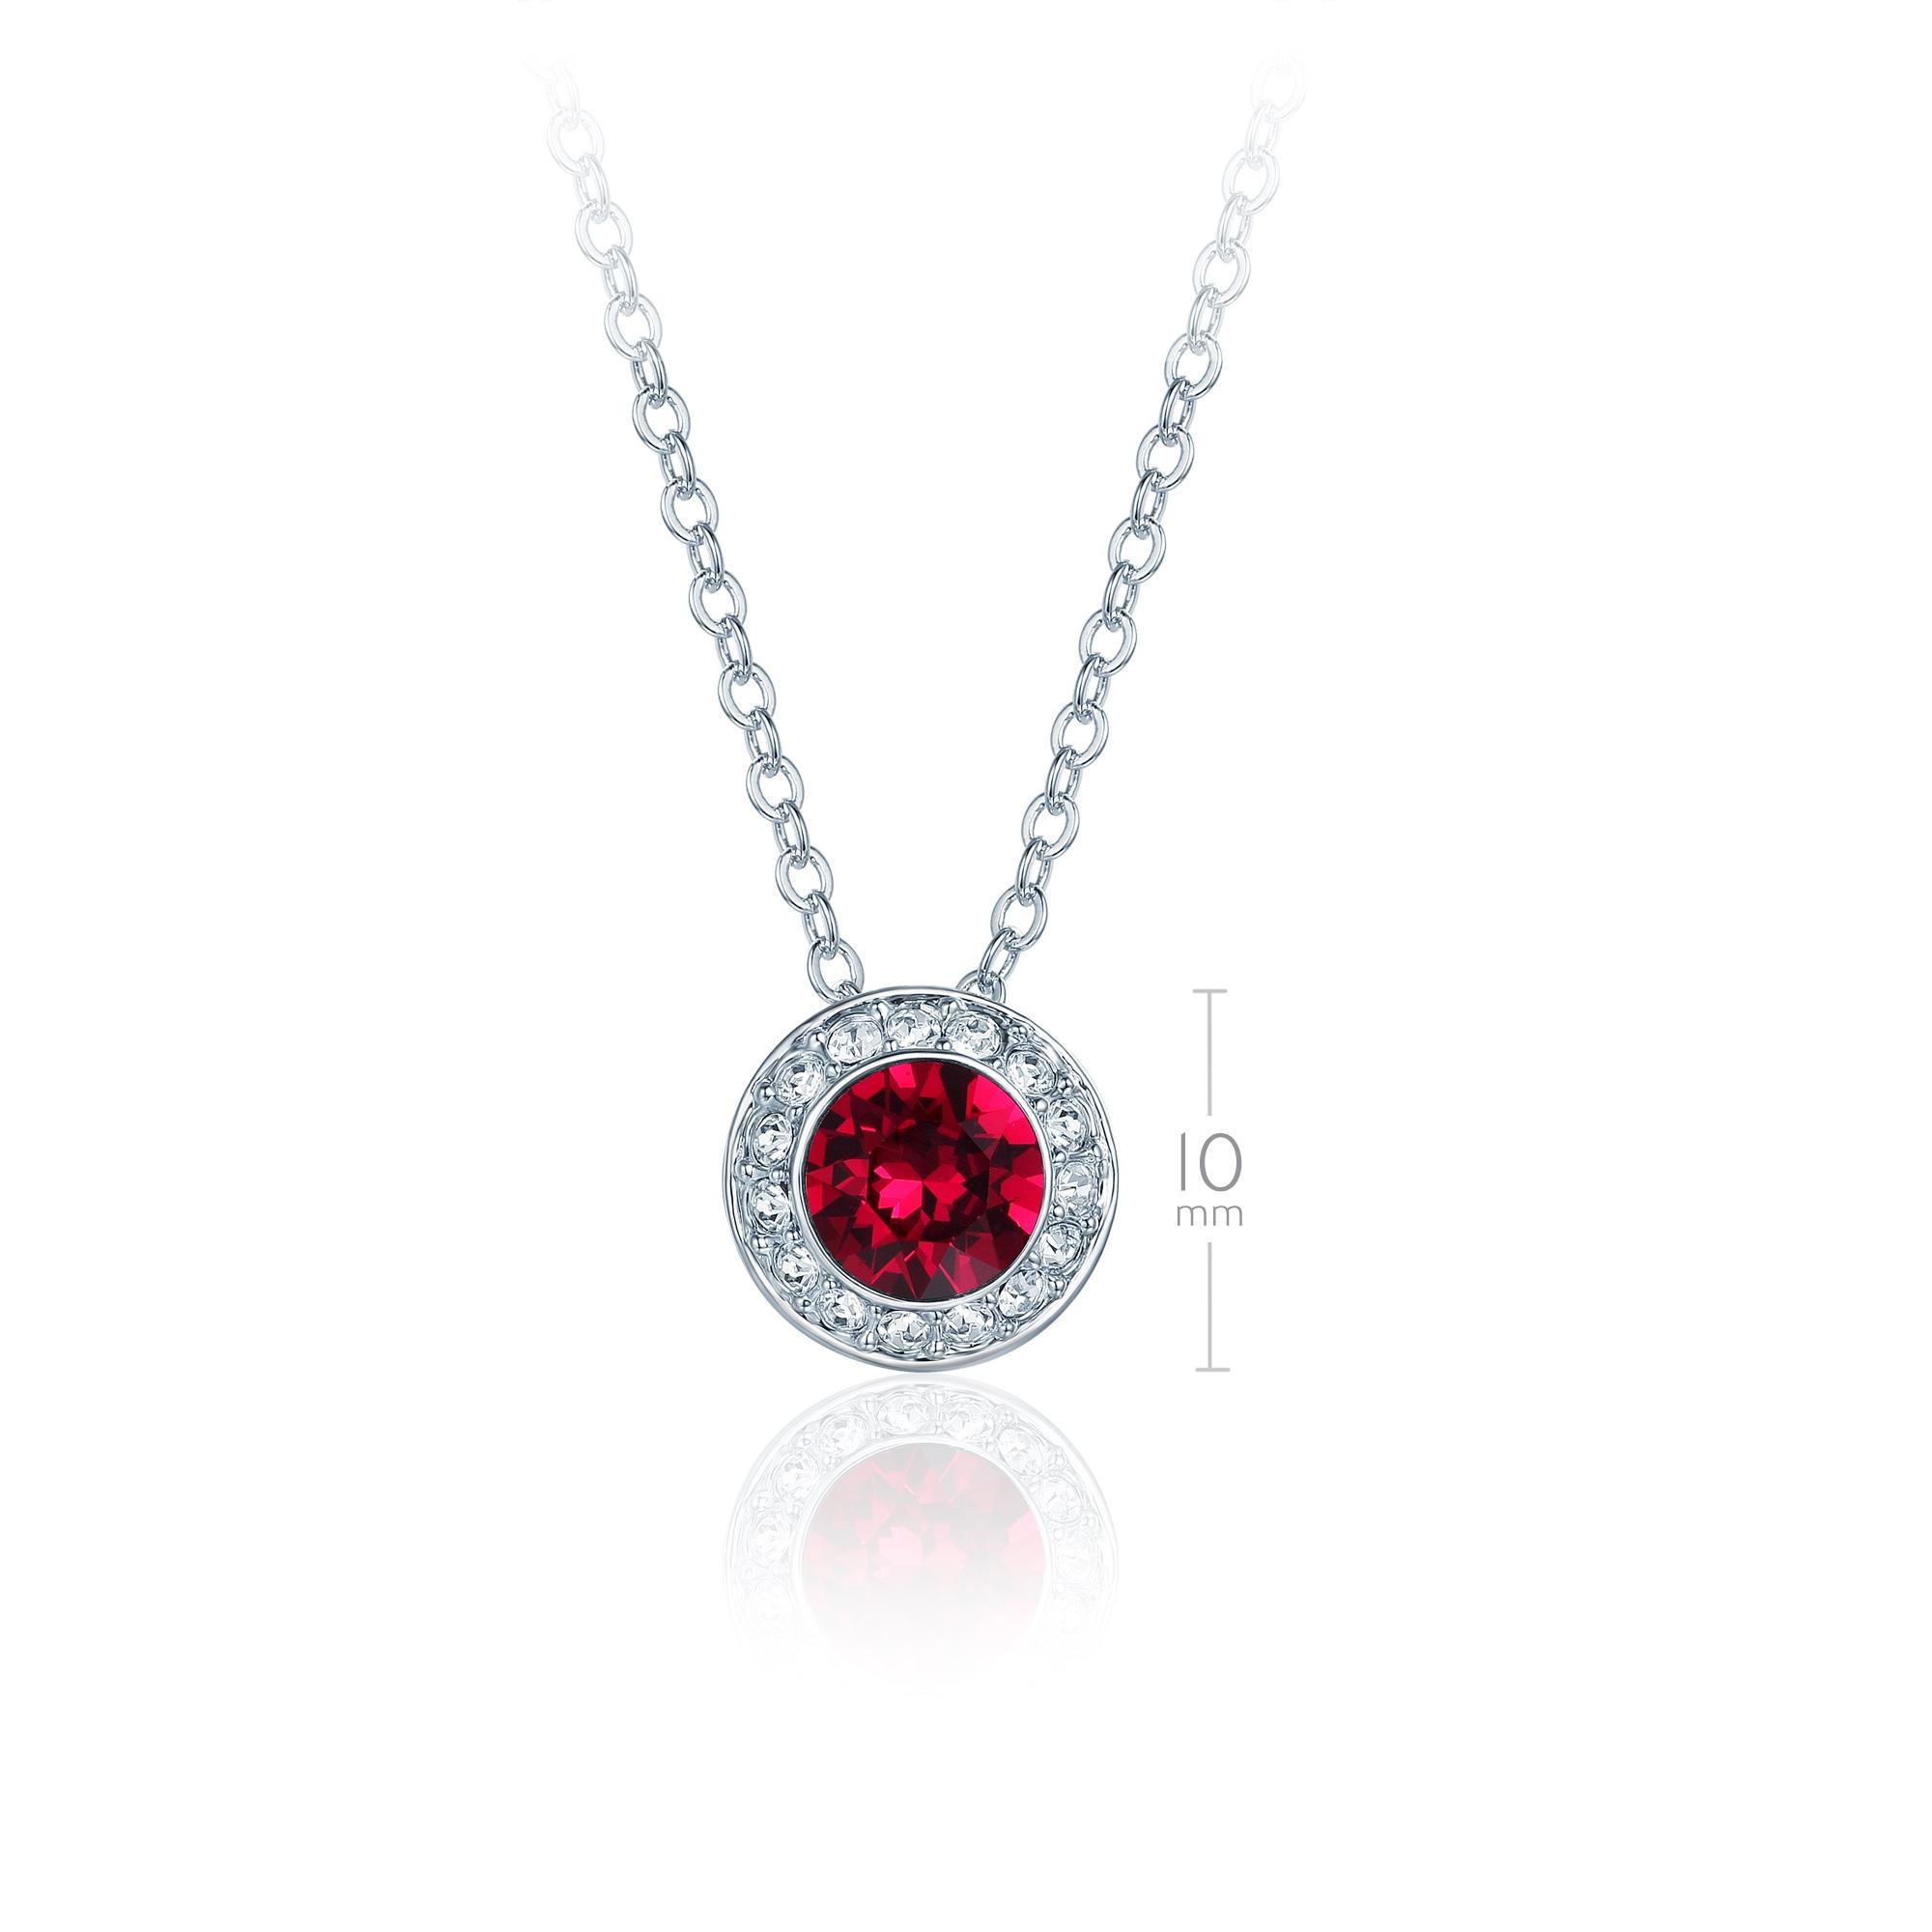 ef0c5f091 Angelic Pendant Necklace with Ruby Red Swarovski Crystals Bride Wedding  MYJS WGP